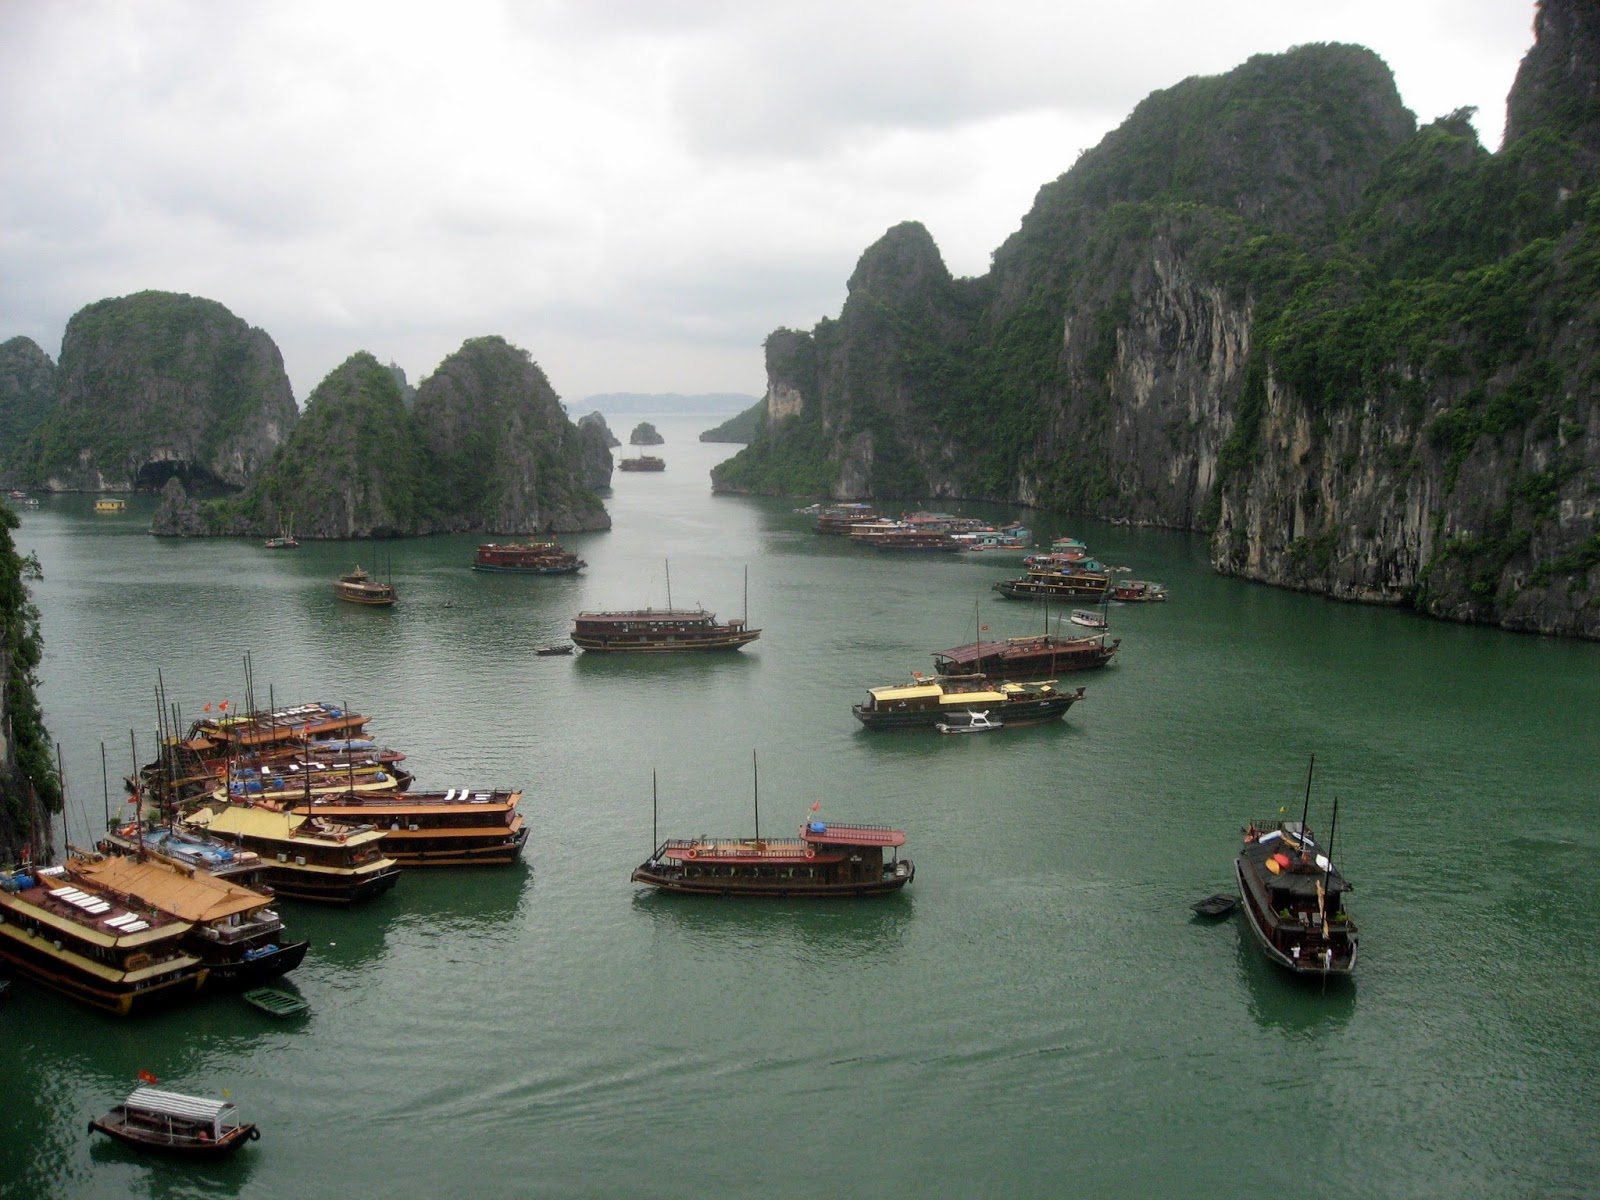 Halong Vietnam  city photos gallery : Malkinphoto: Halong Bay, Vietnam